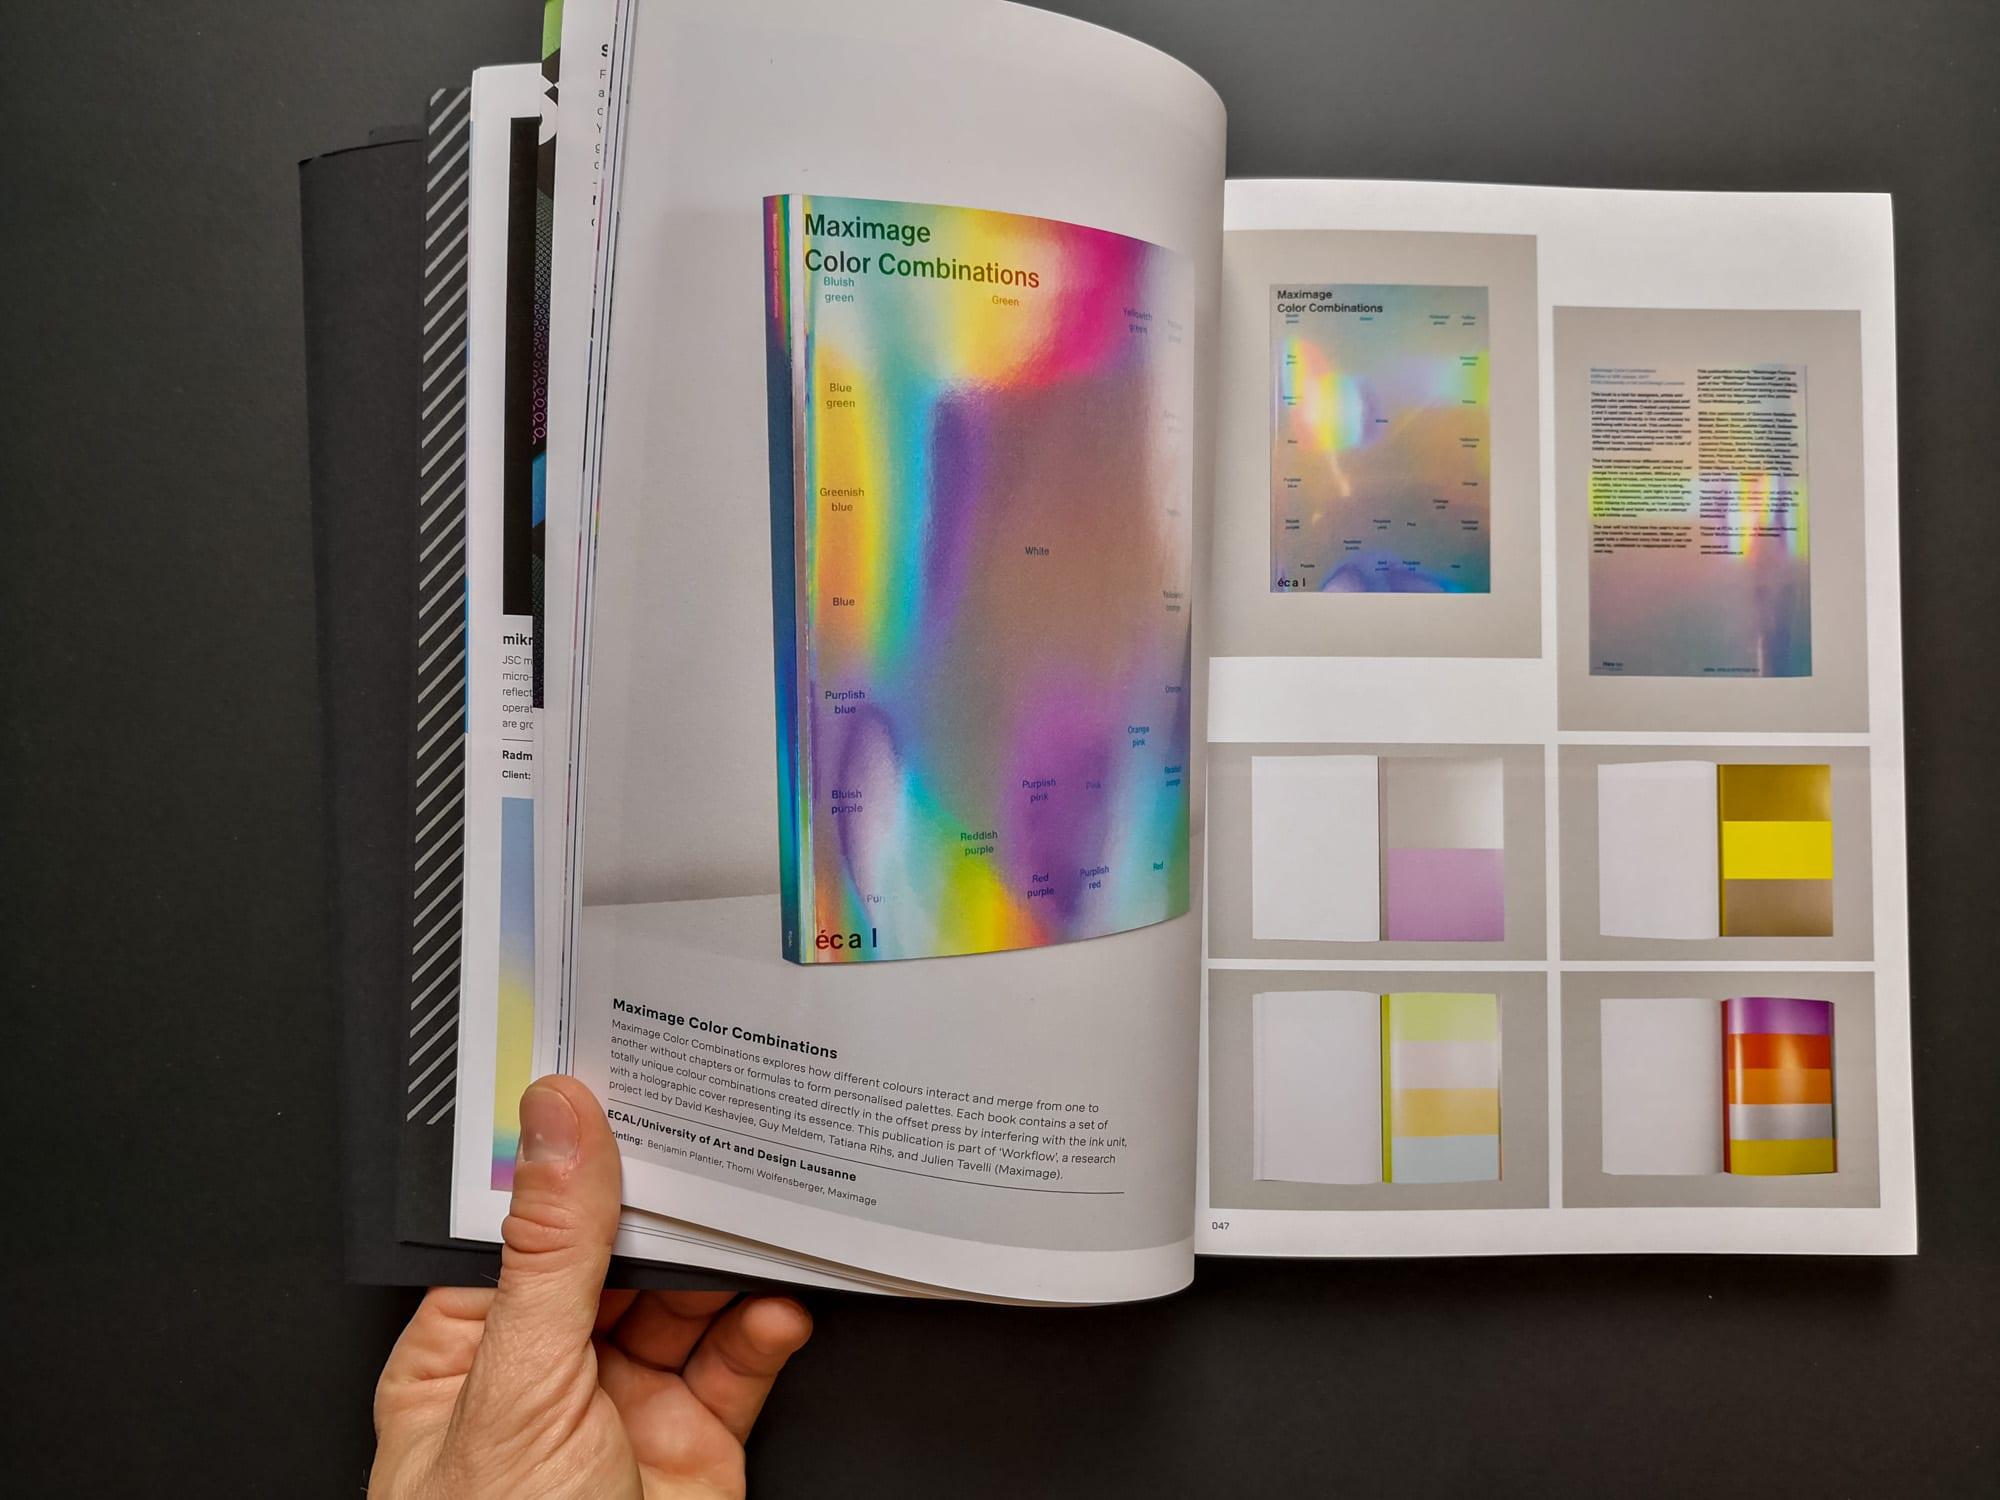 Palette 08 : Iridescent. Maximage Color Combinations